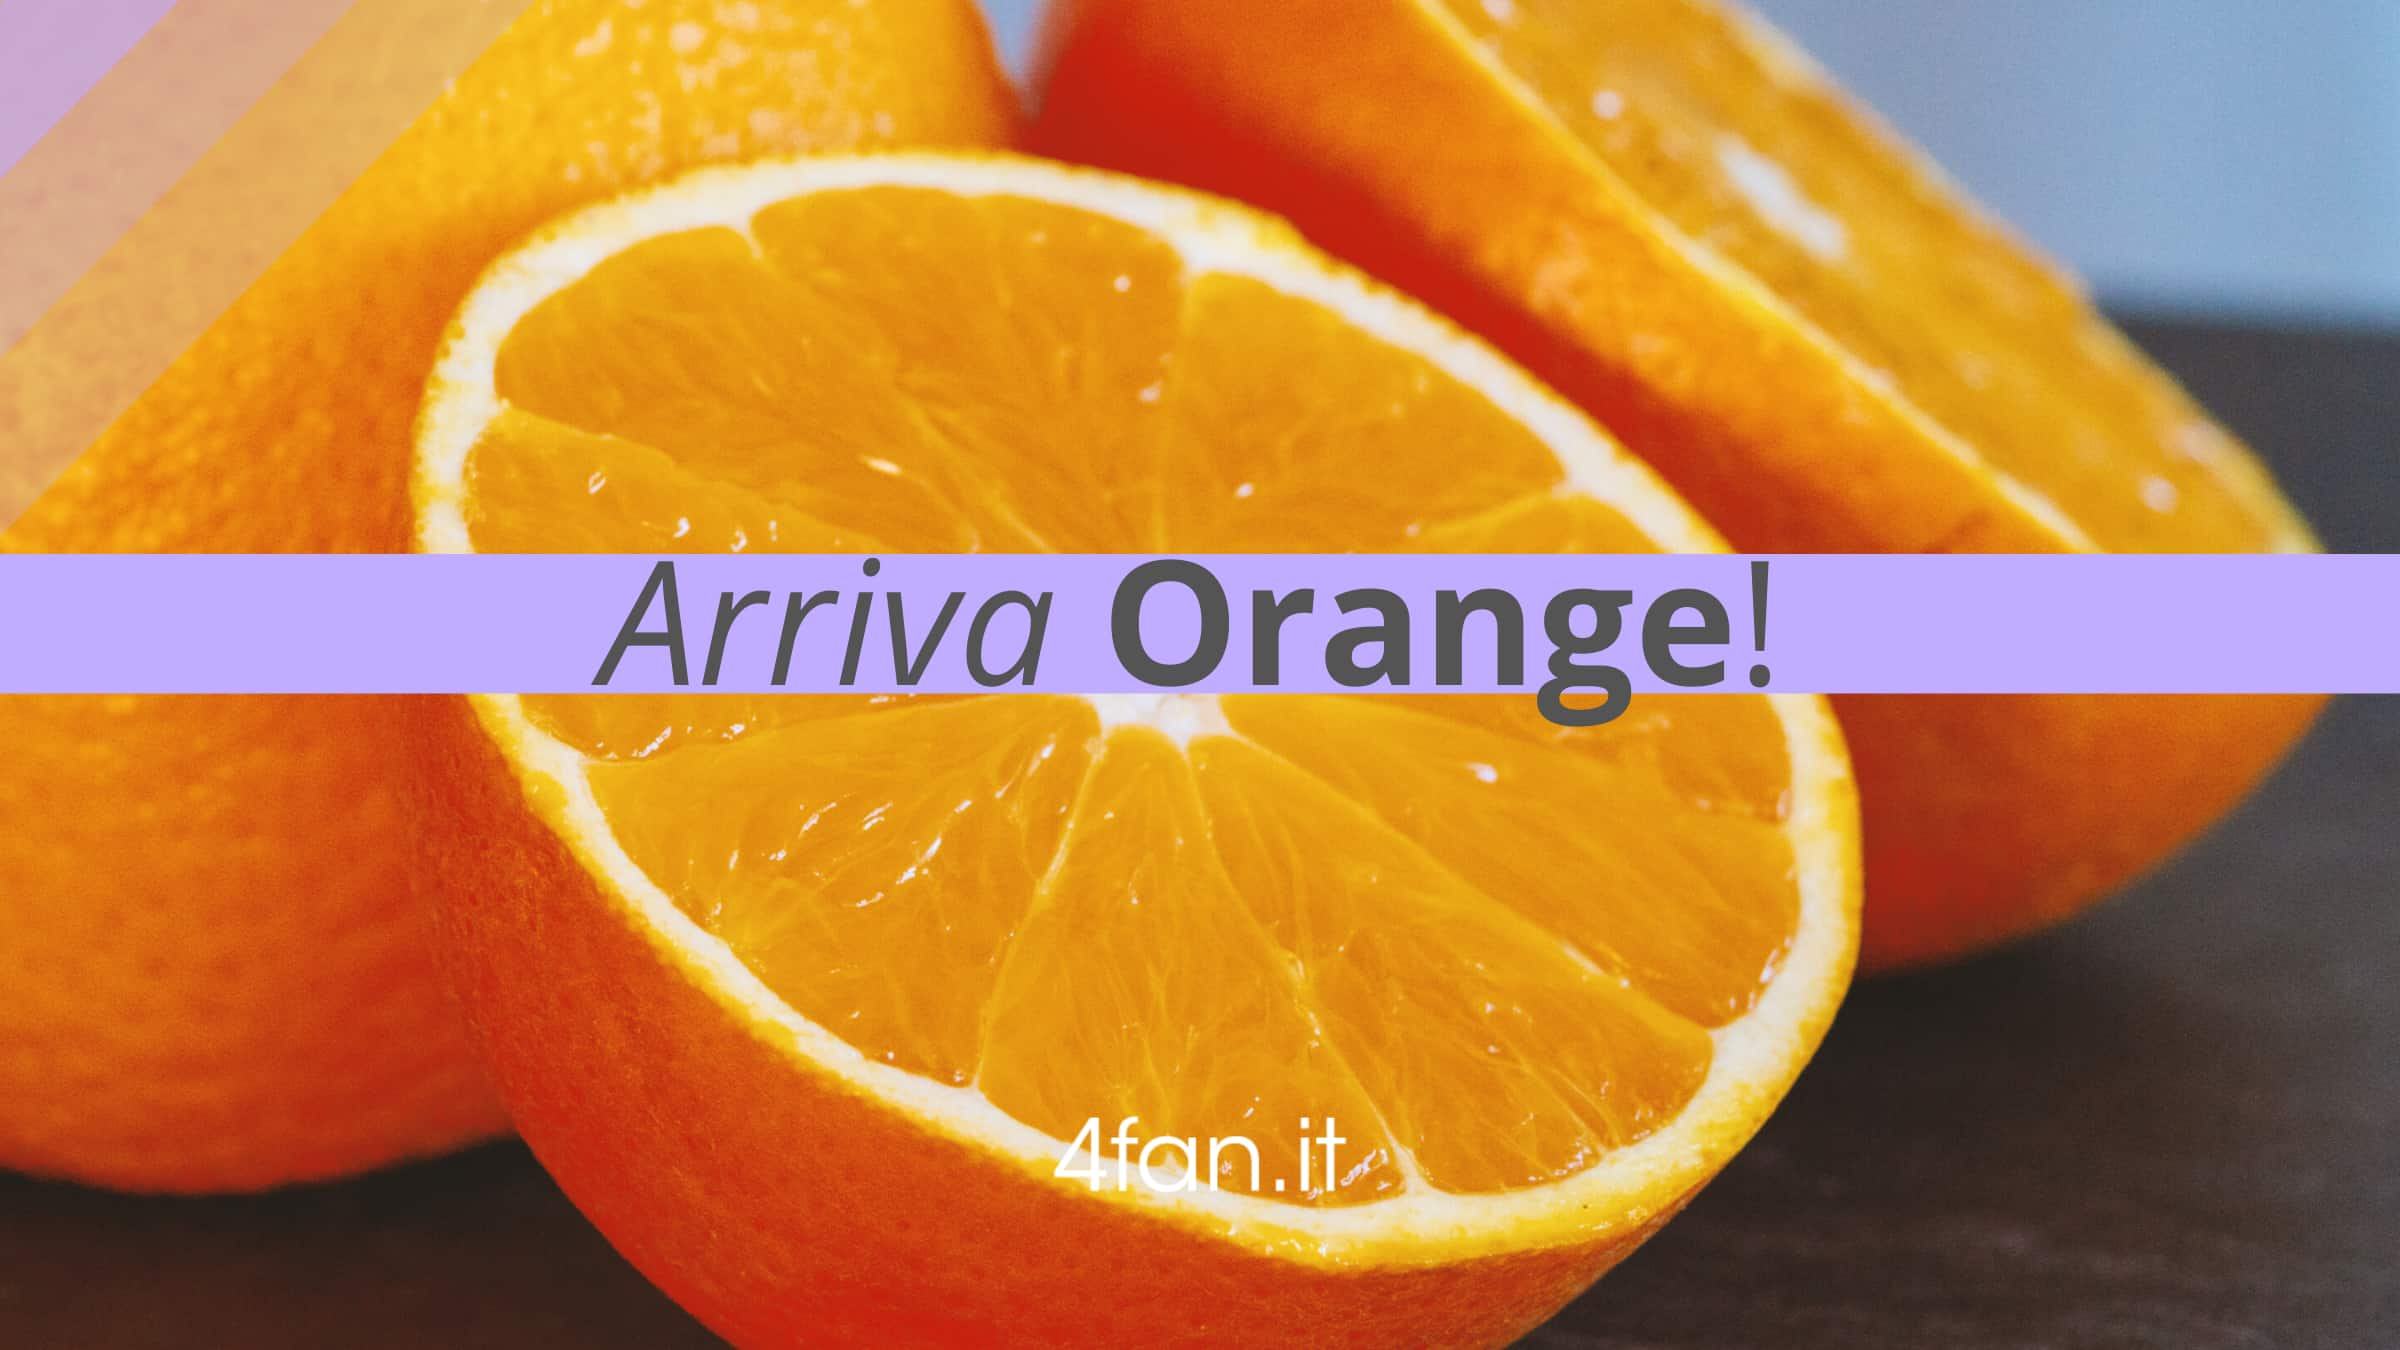 Arriva Orange